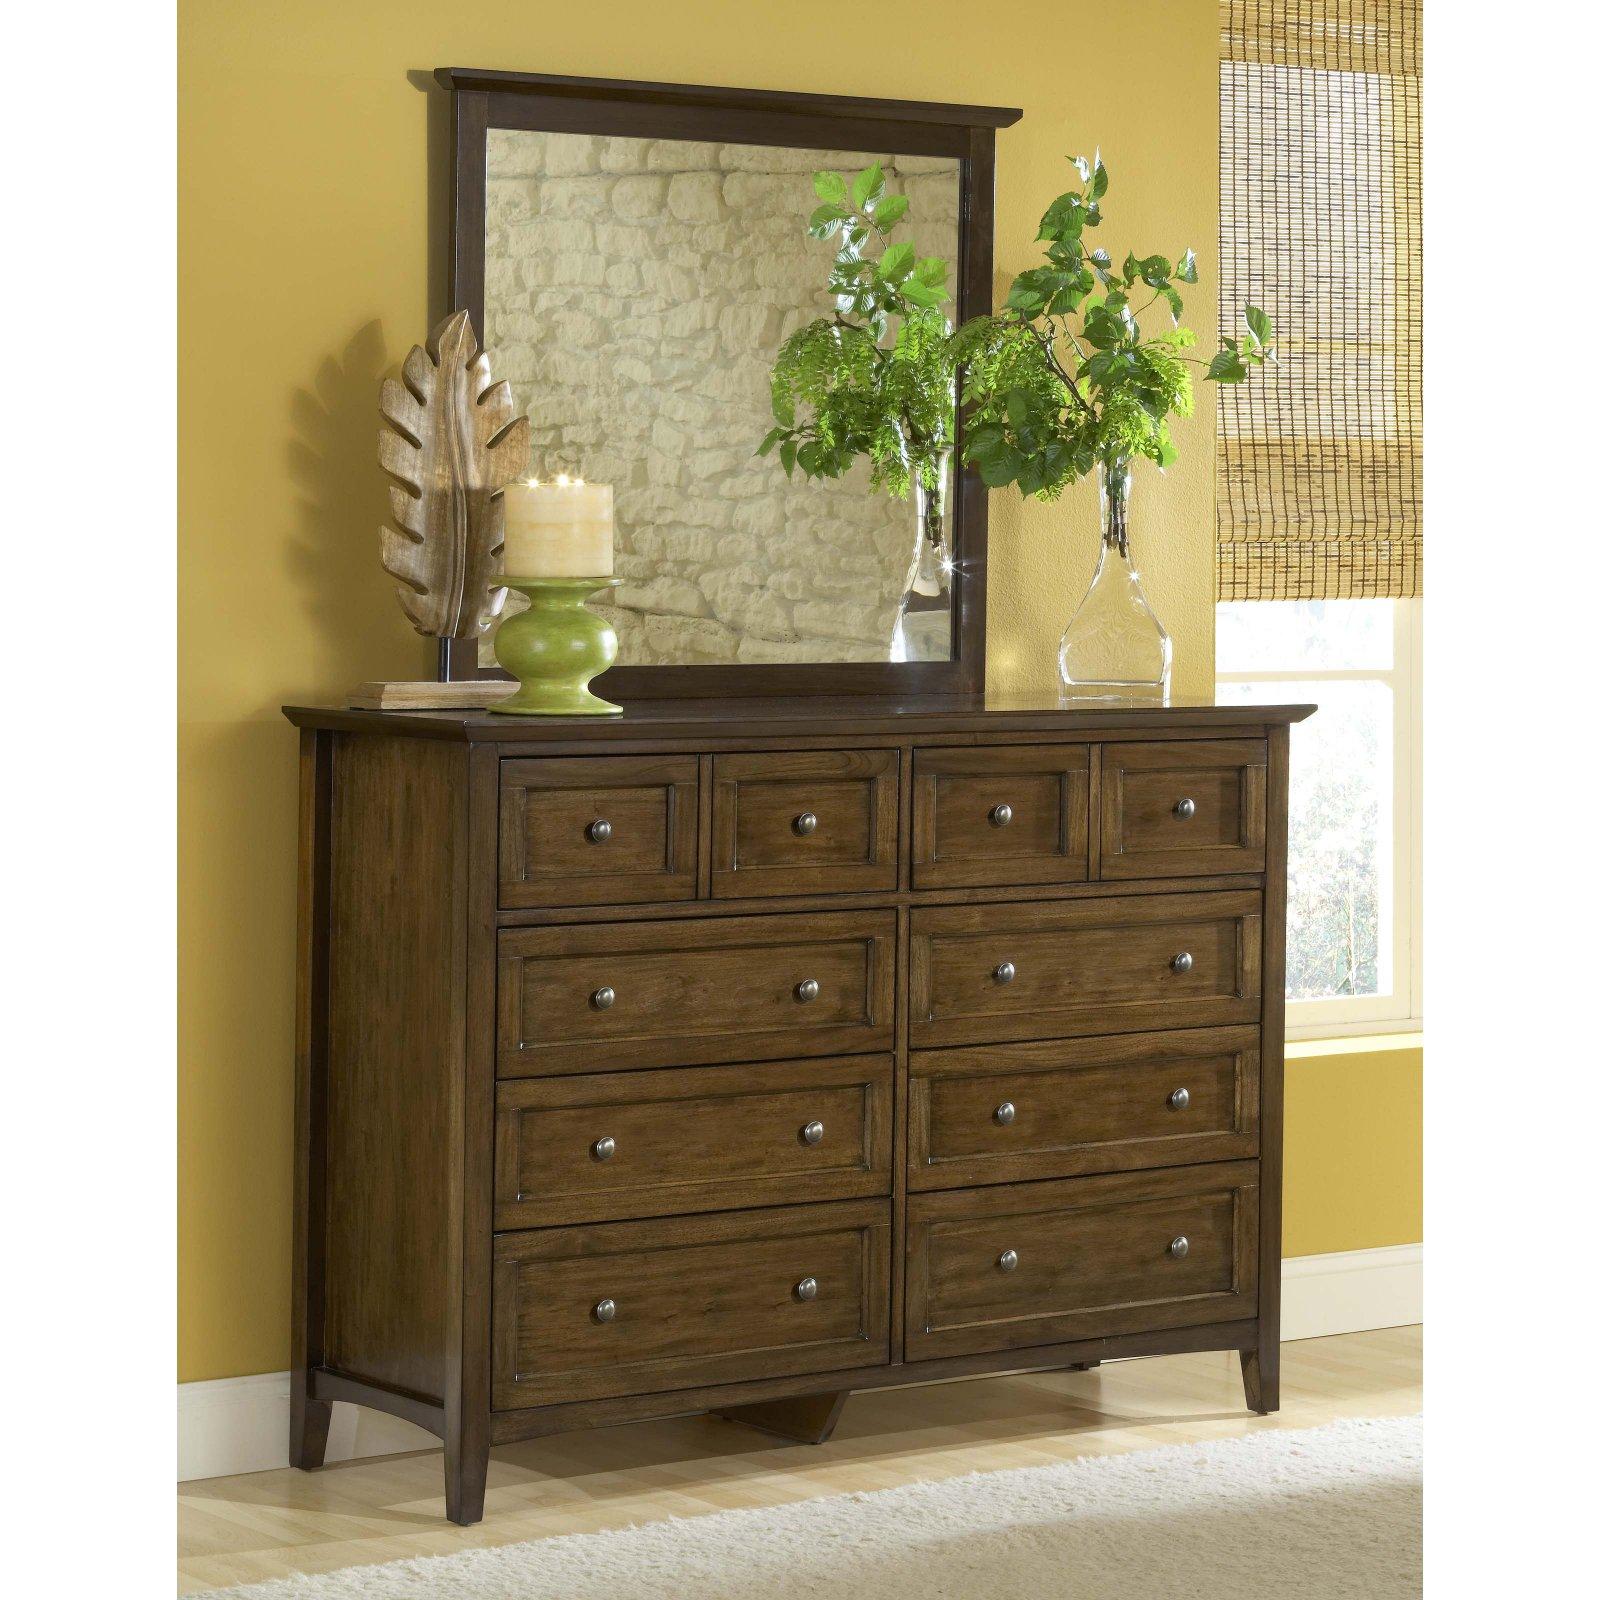 Modus Paragon 8 Drawer Dresser by Modus Furniture